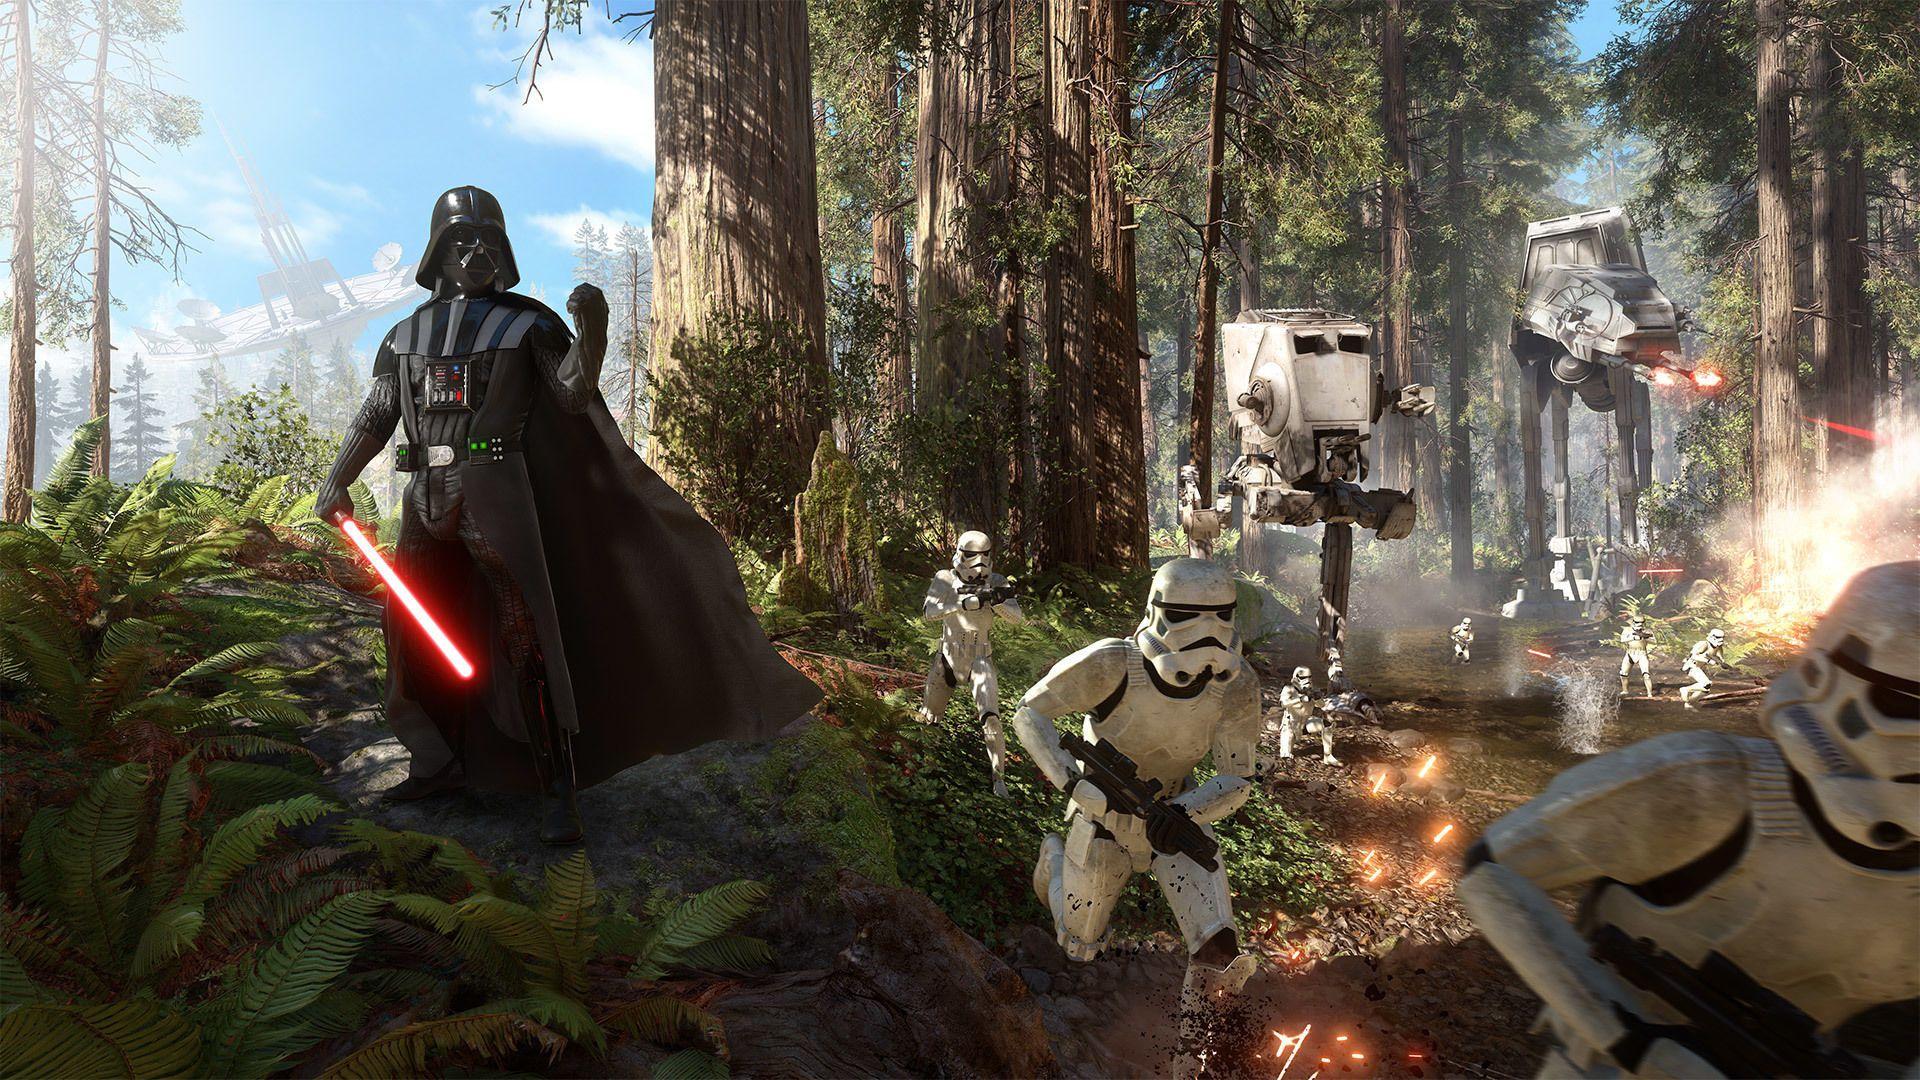 star wars battlefront wallpaper - Google Search